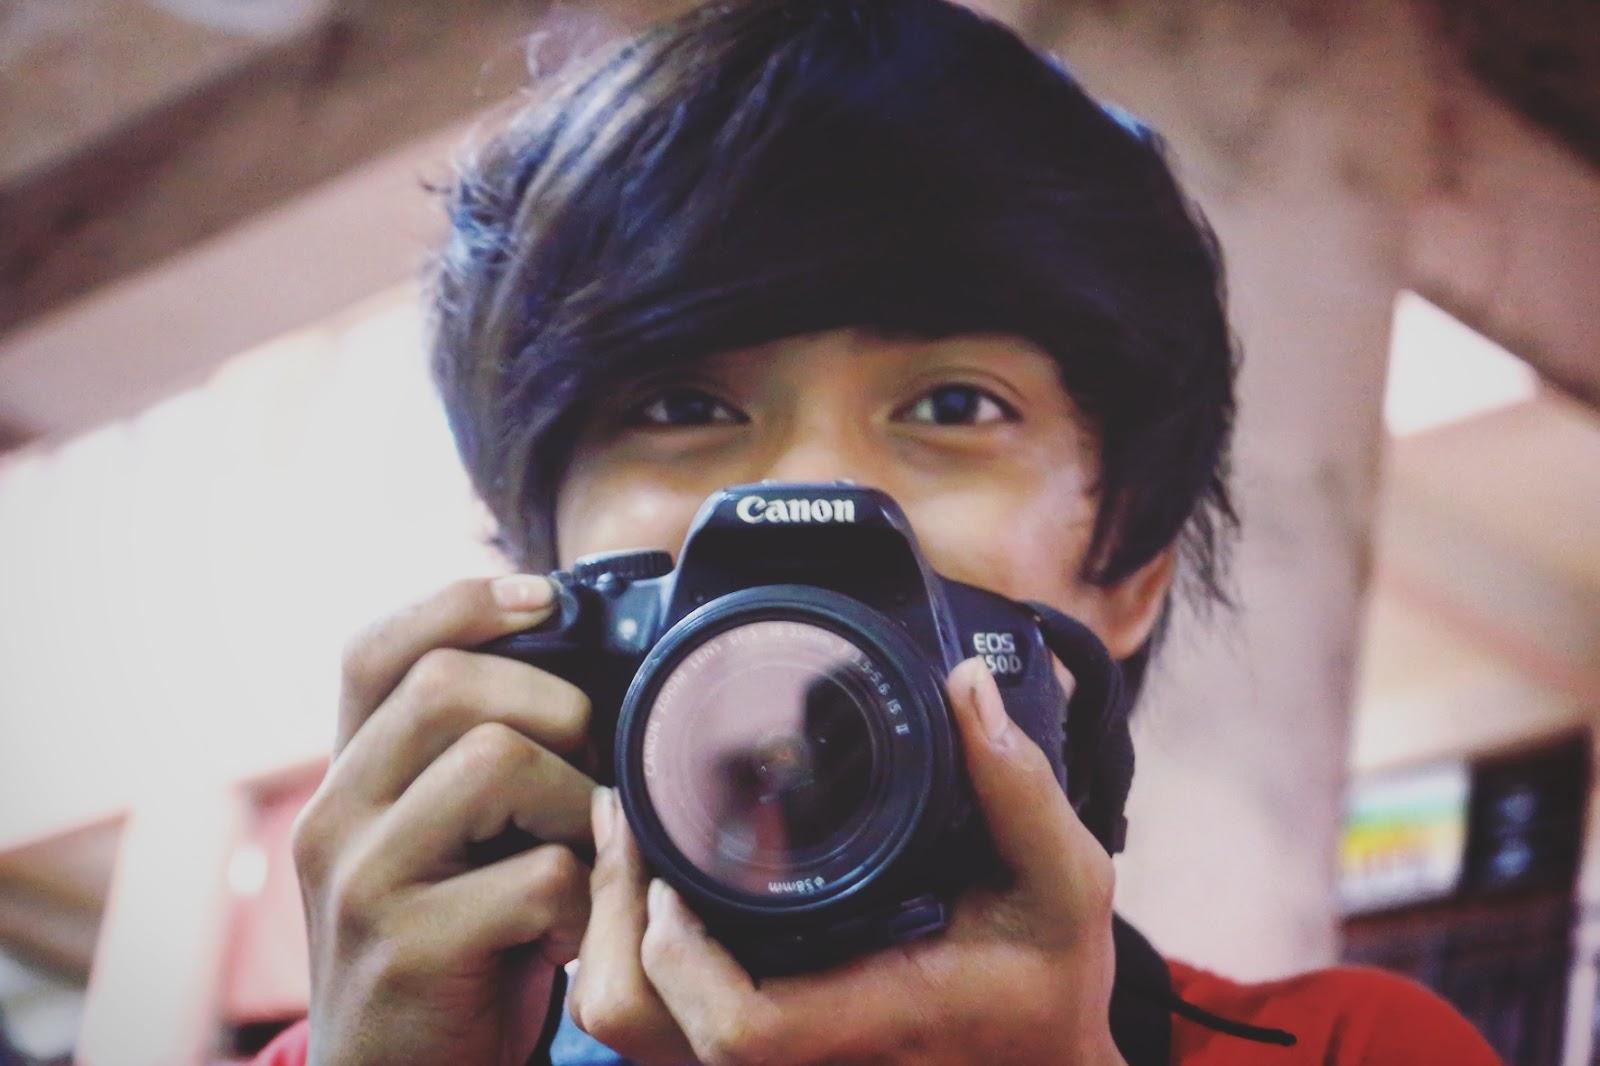 photographer biodata